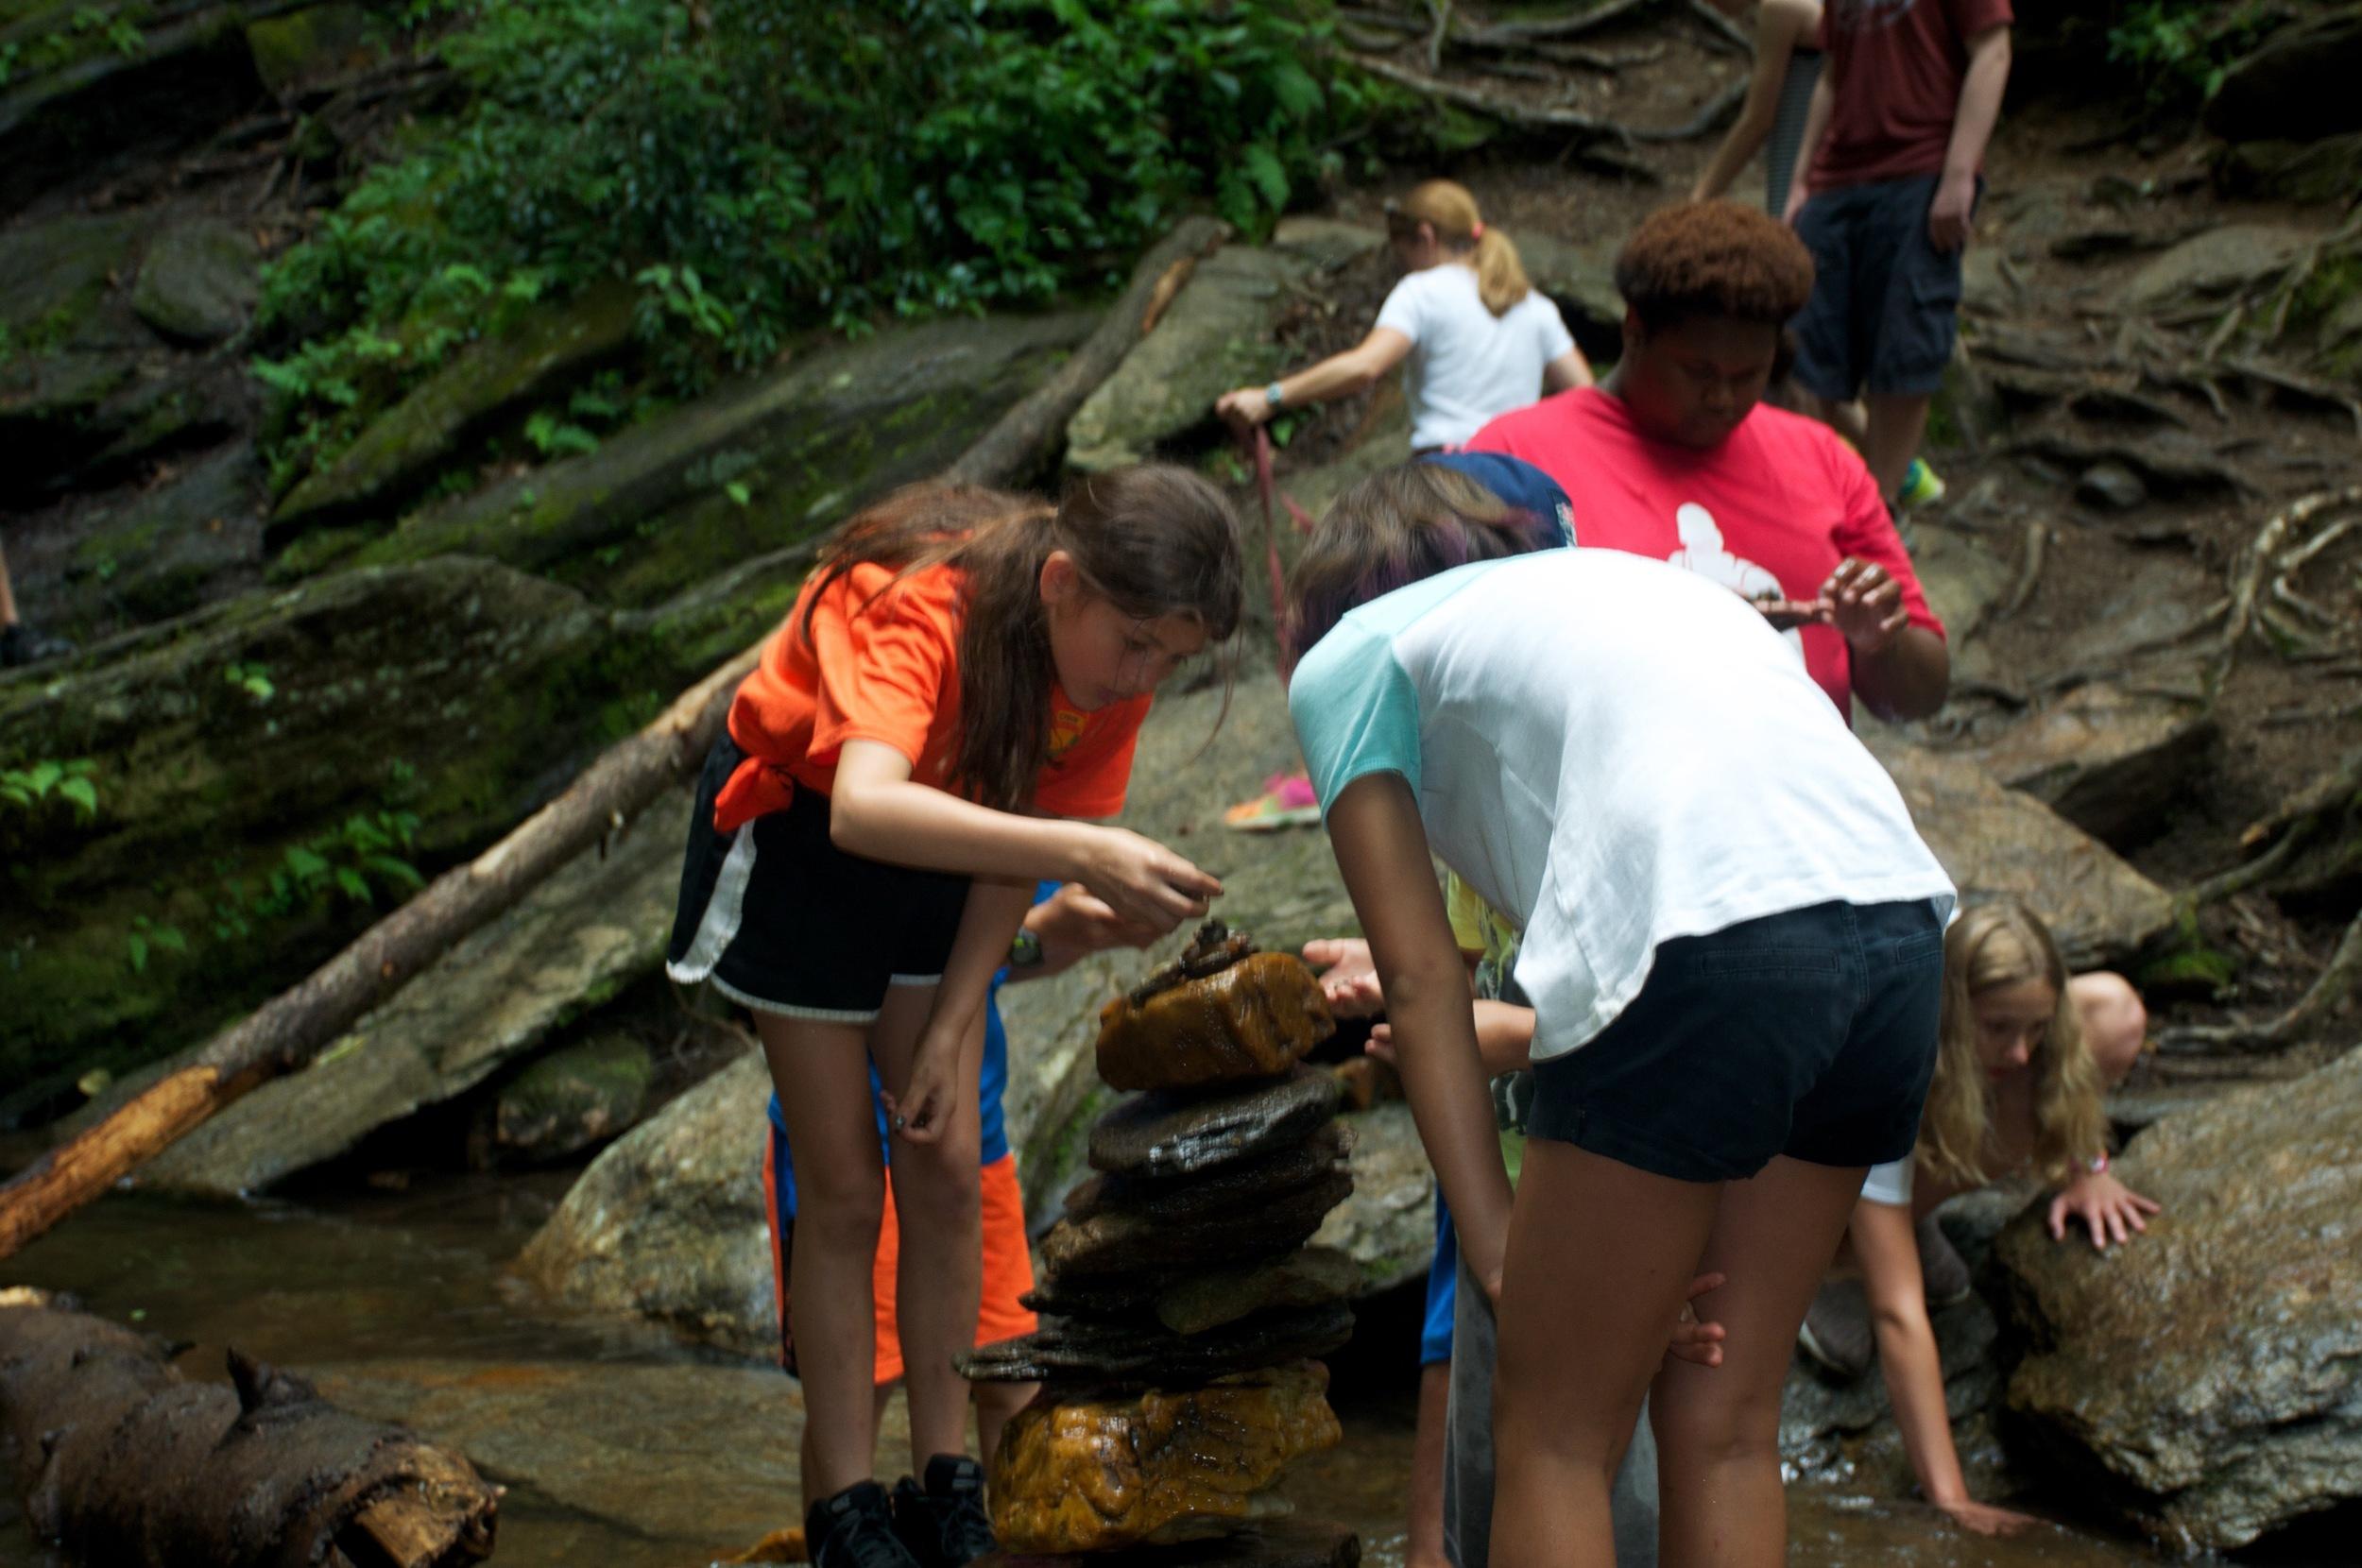 Exploring in the creek.